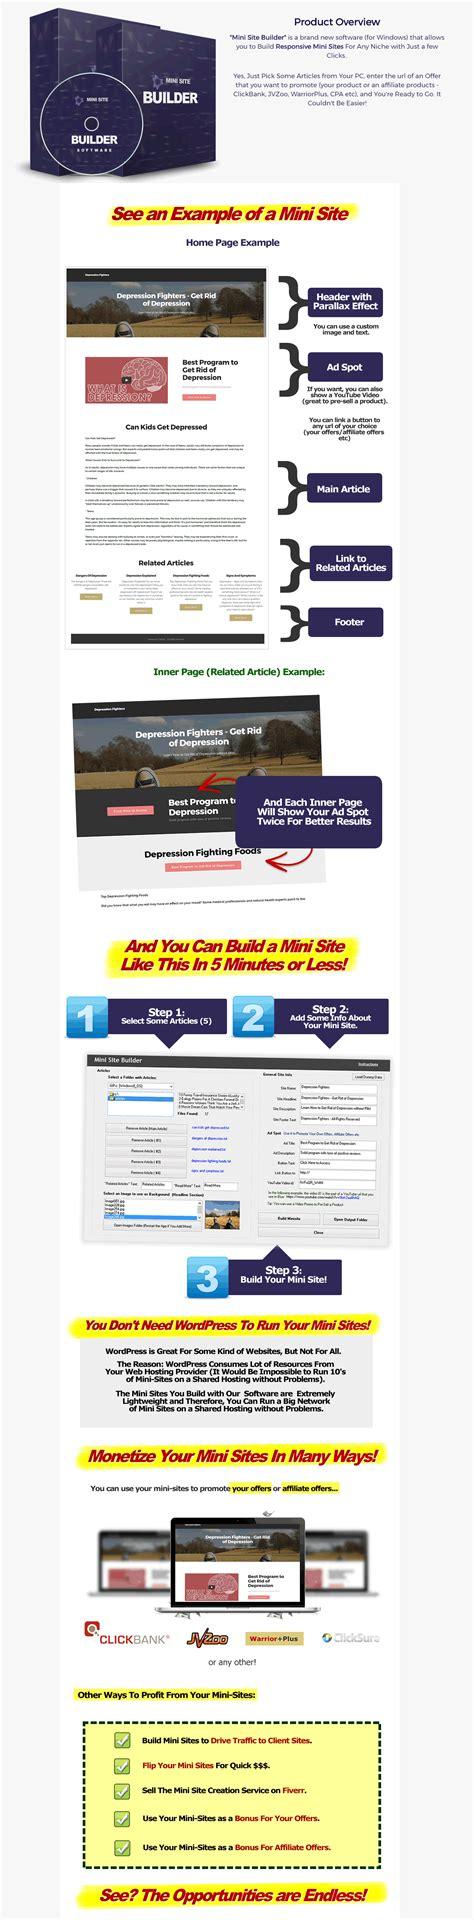 website templates for yahoo sitebuilder attractive yahoo sitebuilder templates gallery